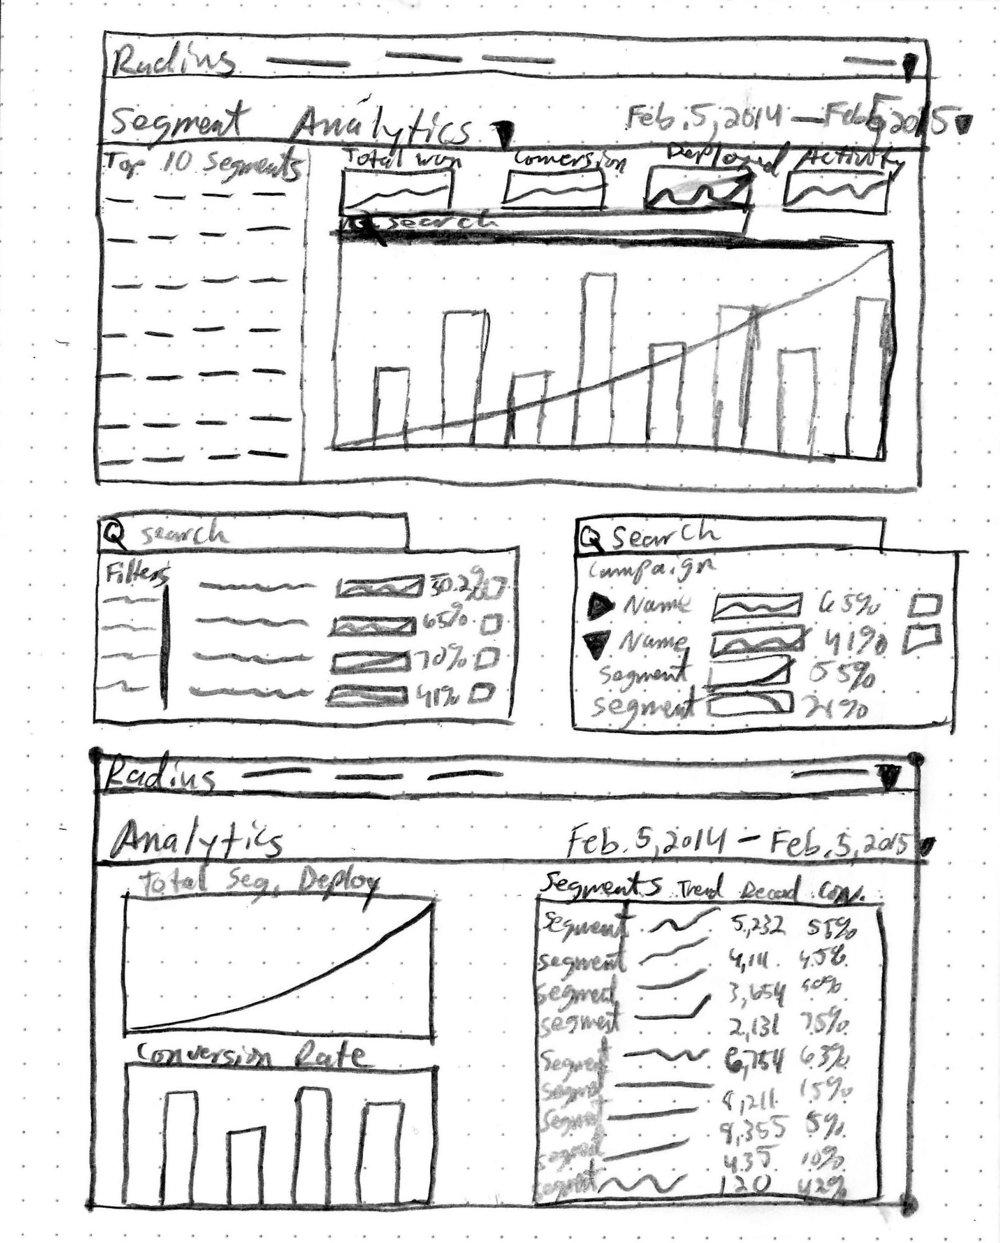 analytics sketch 022015-1.jpg